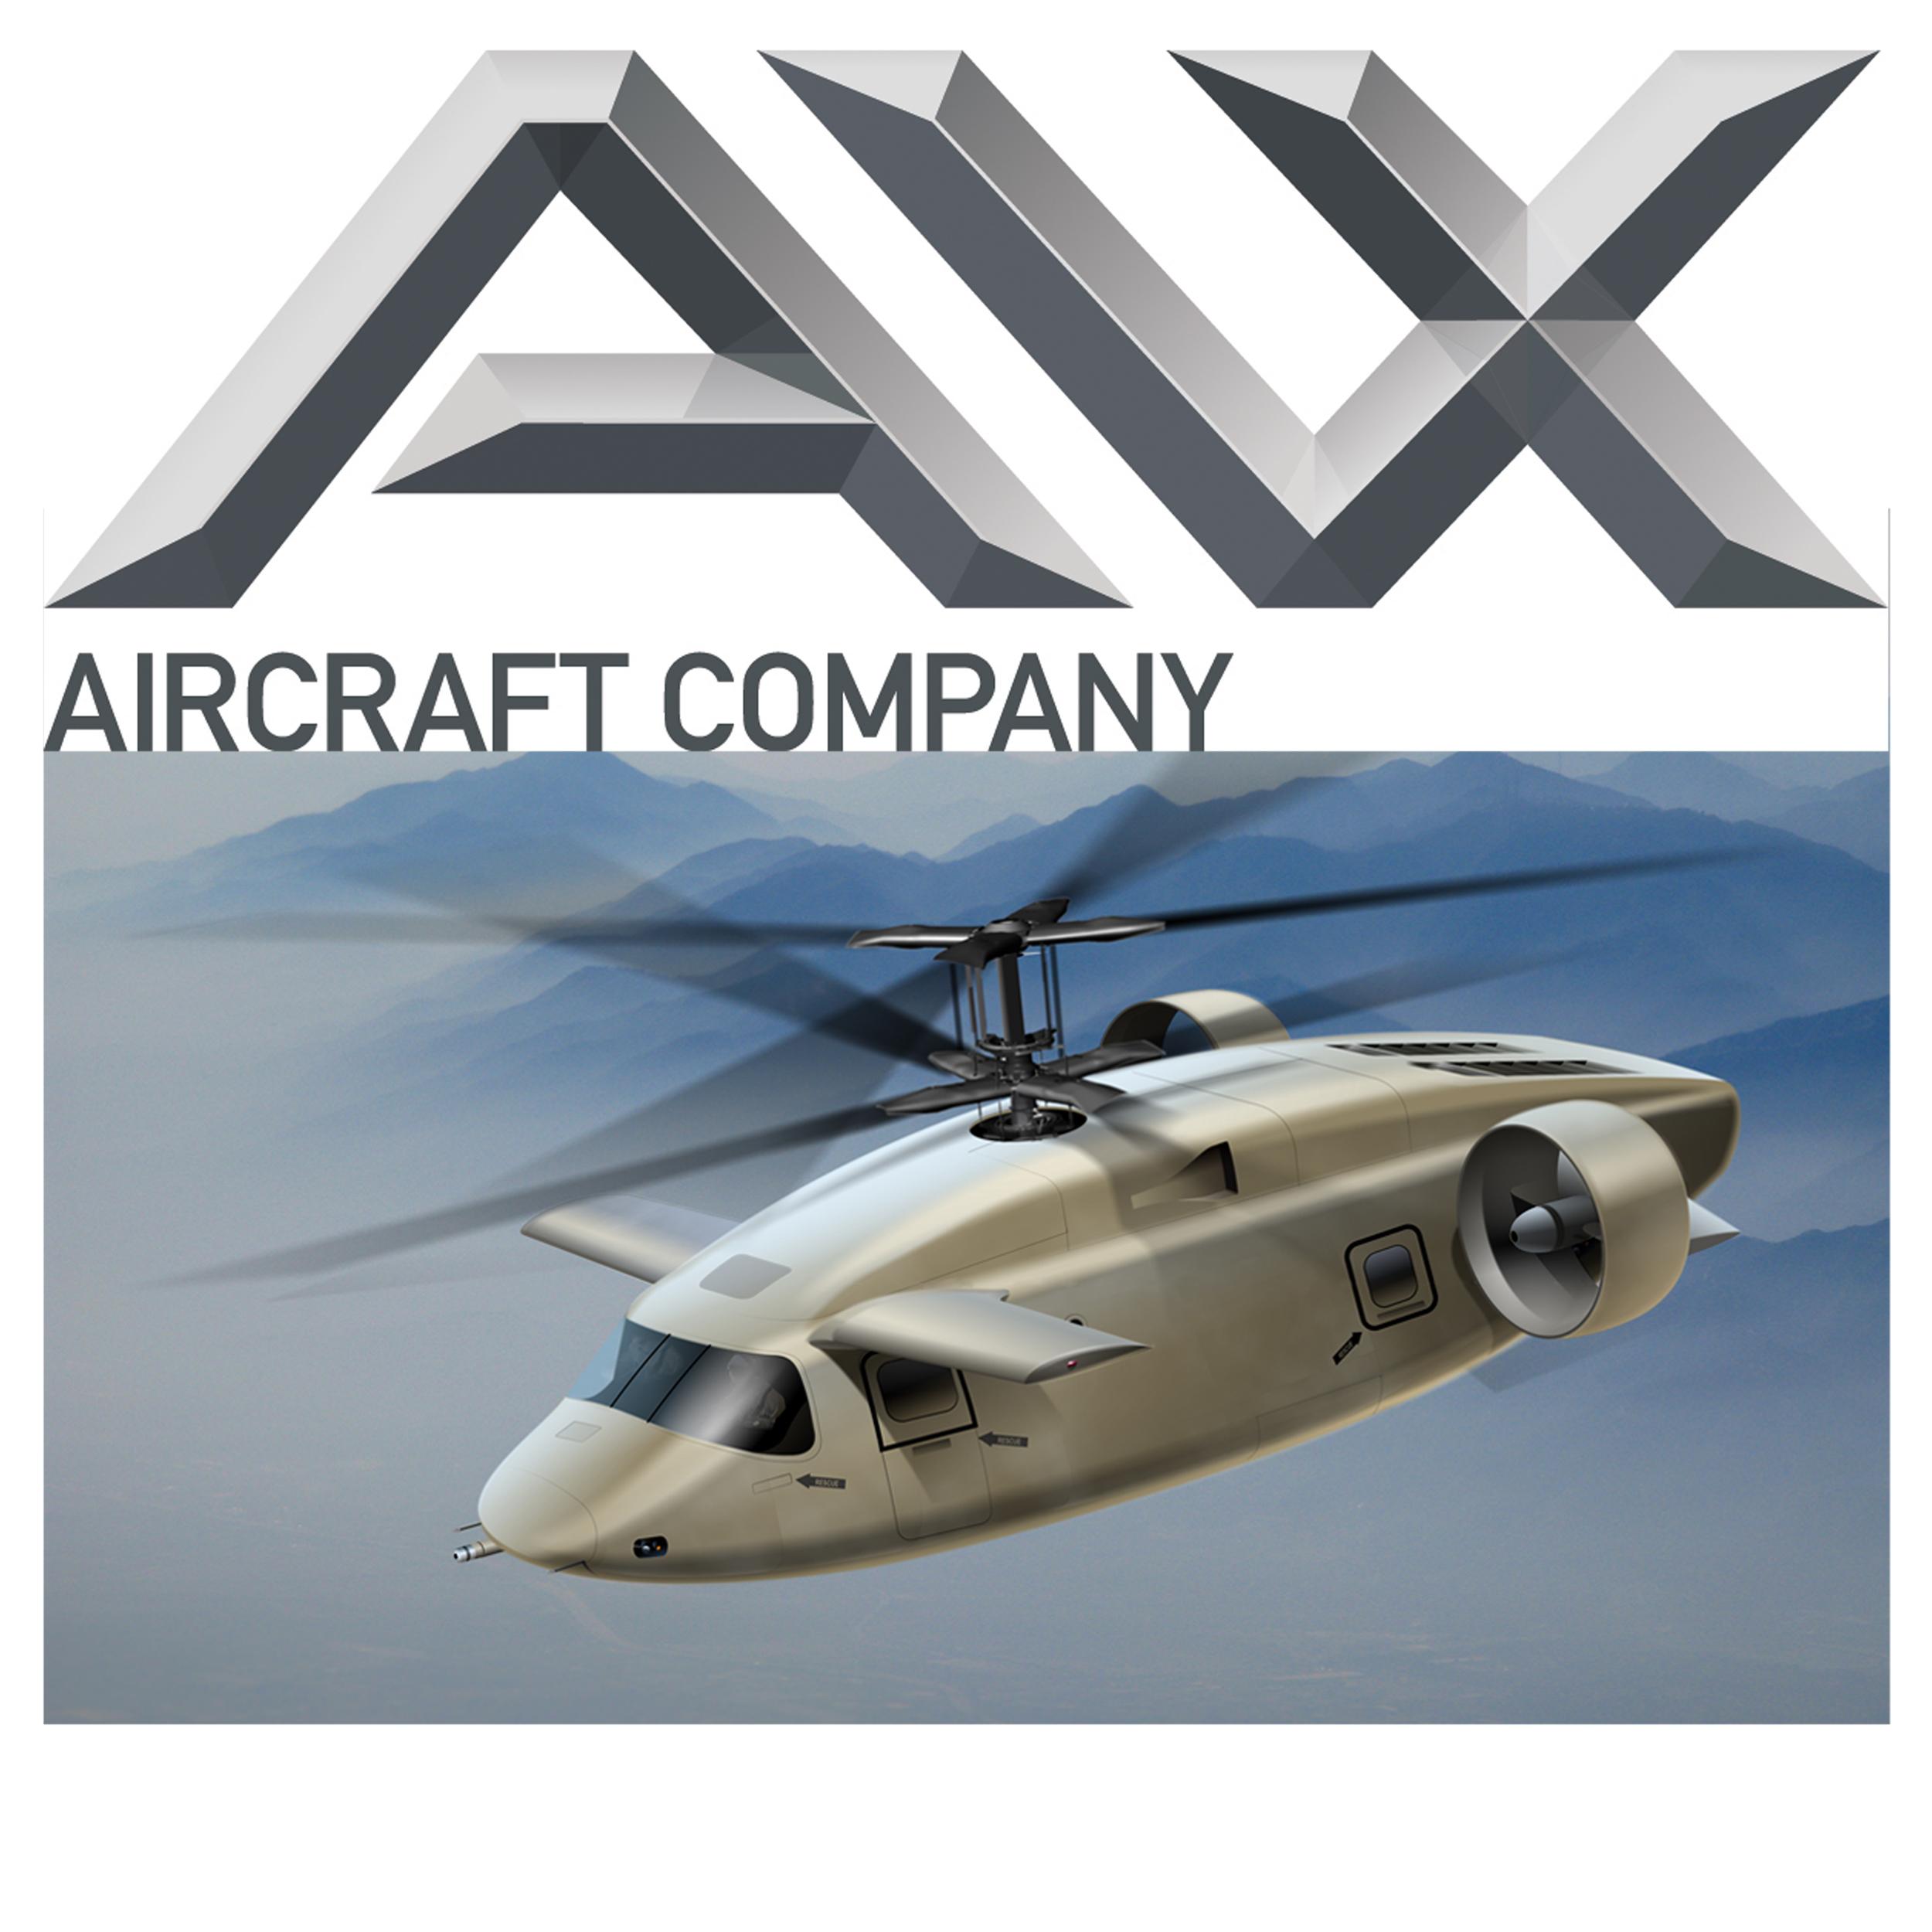 A VX Aircraft Company